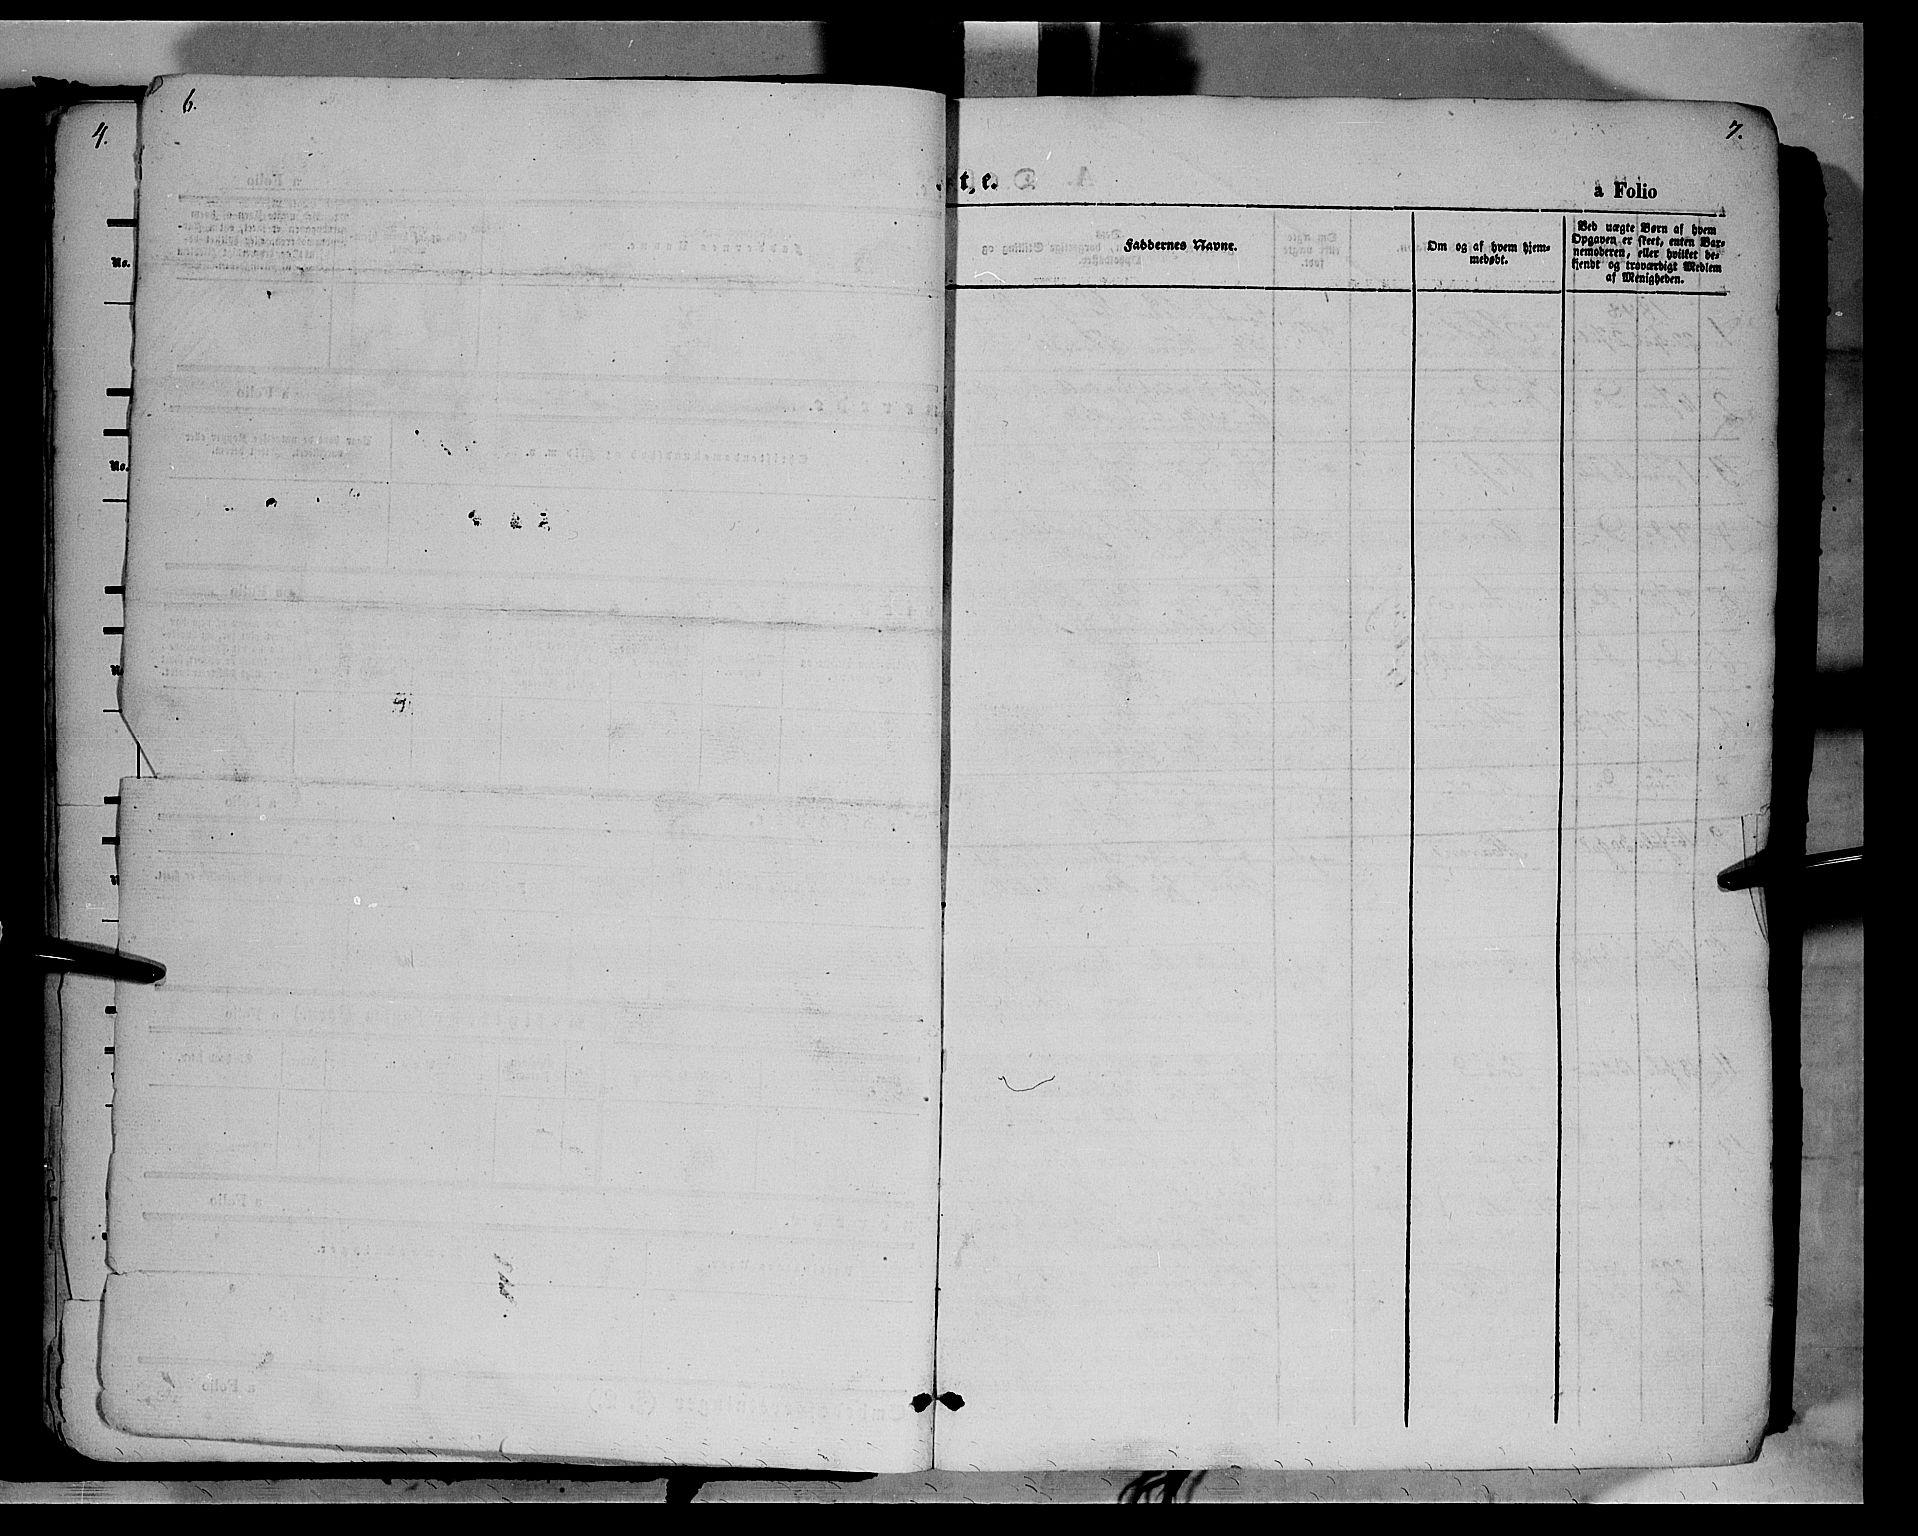 SAH, Ringebu prestekontor, Ministerialbok nr. 6, 1848-1859, s. 6-7